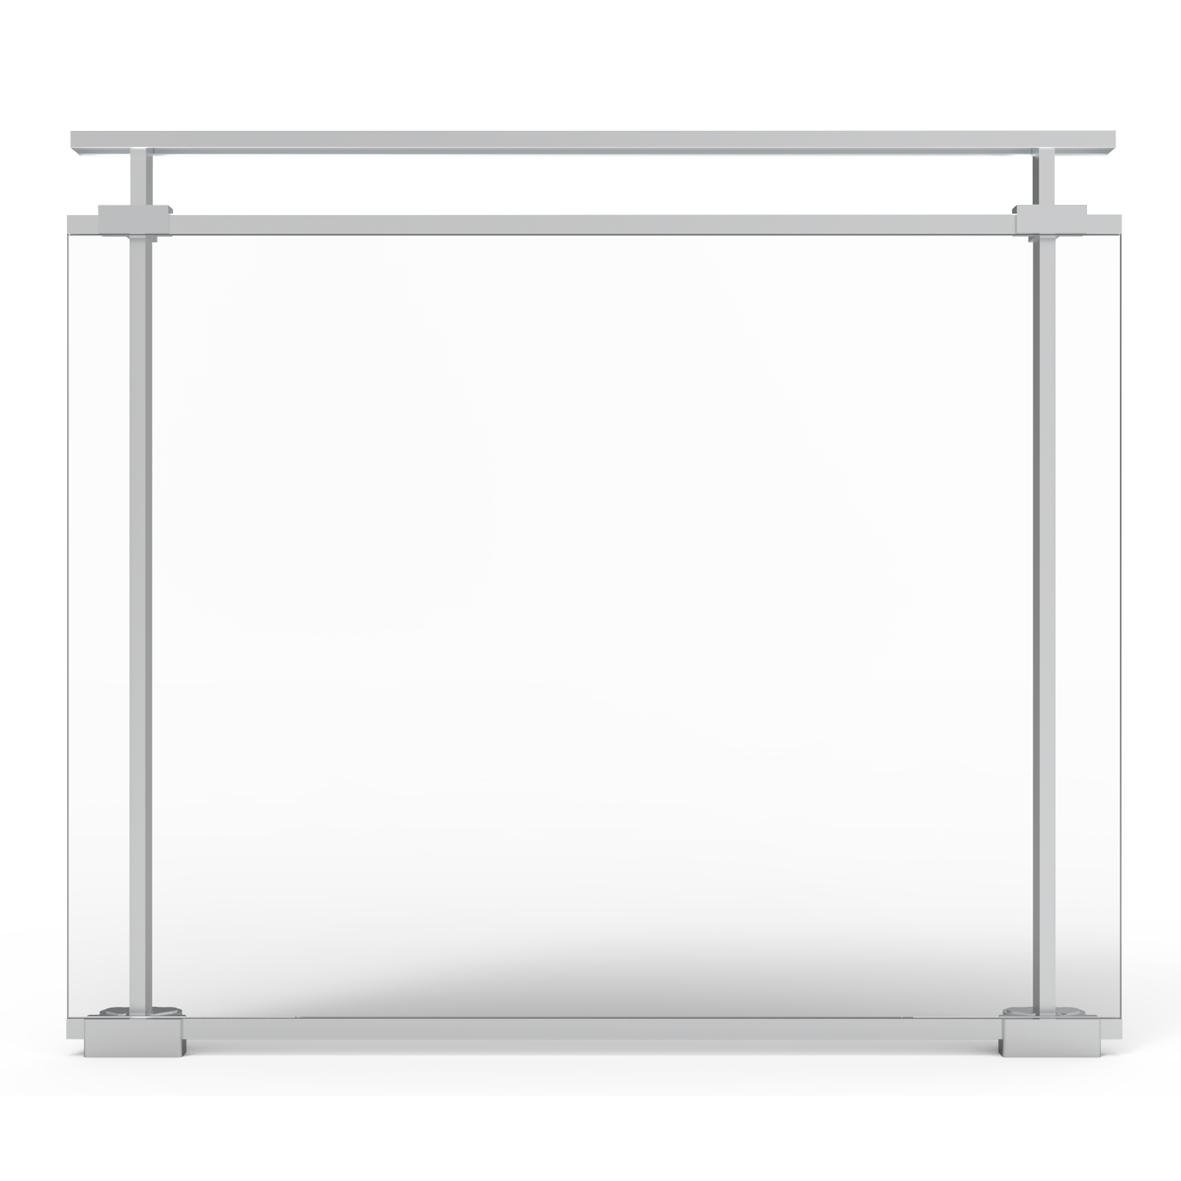 https://www.allpaint.it/wp-content/uploads/2021/07/ringhiere-alluminio-easy-allpaint.jpg